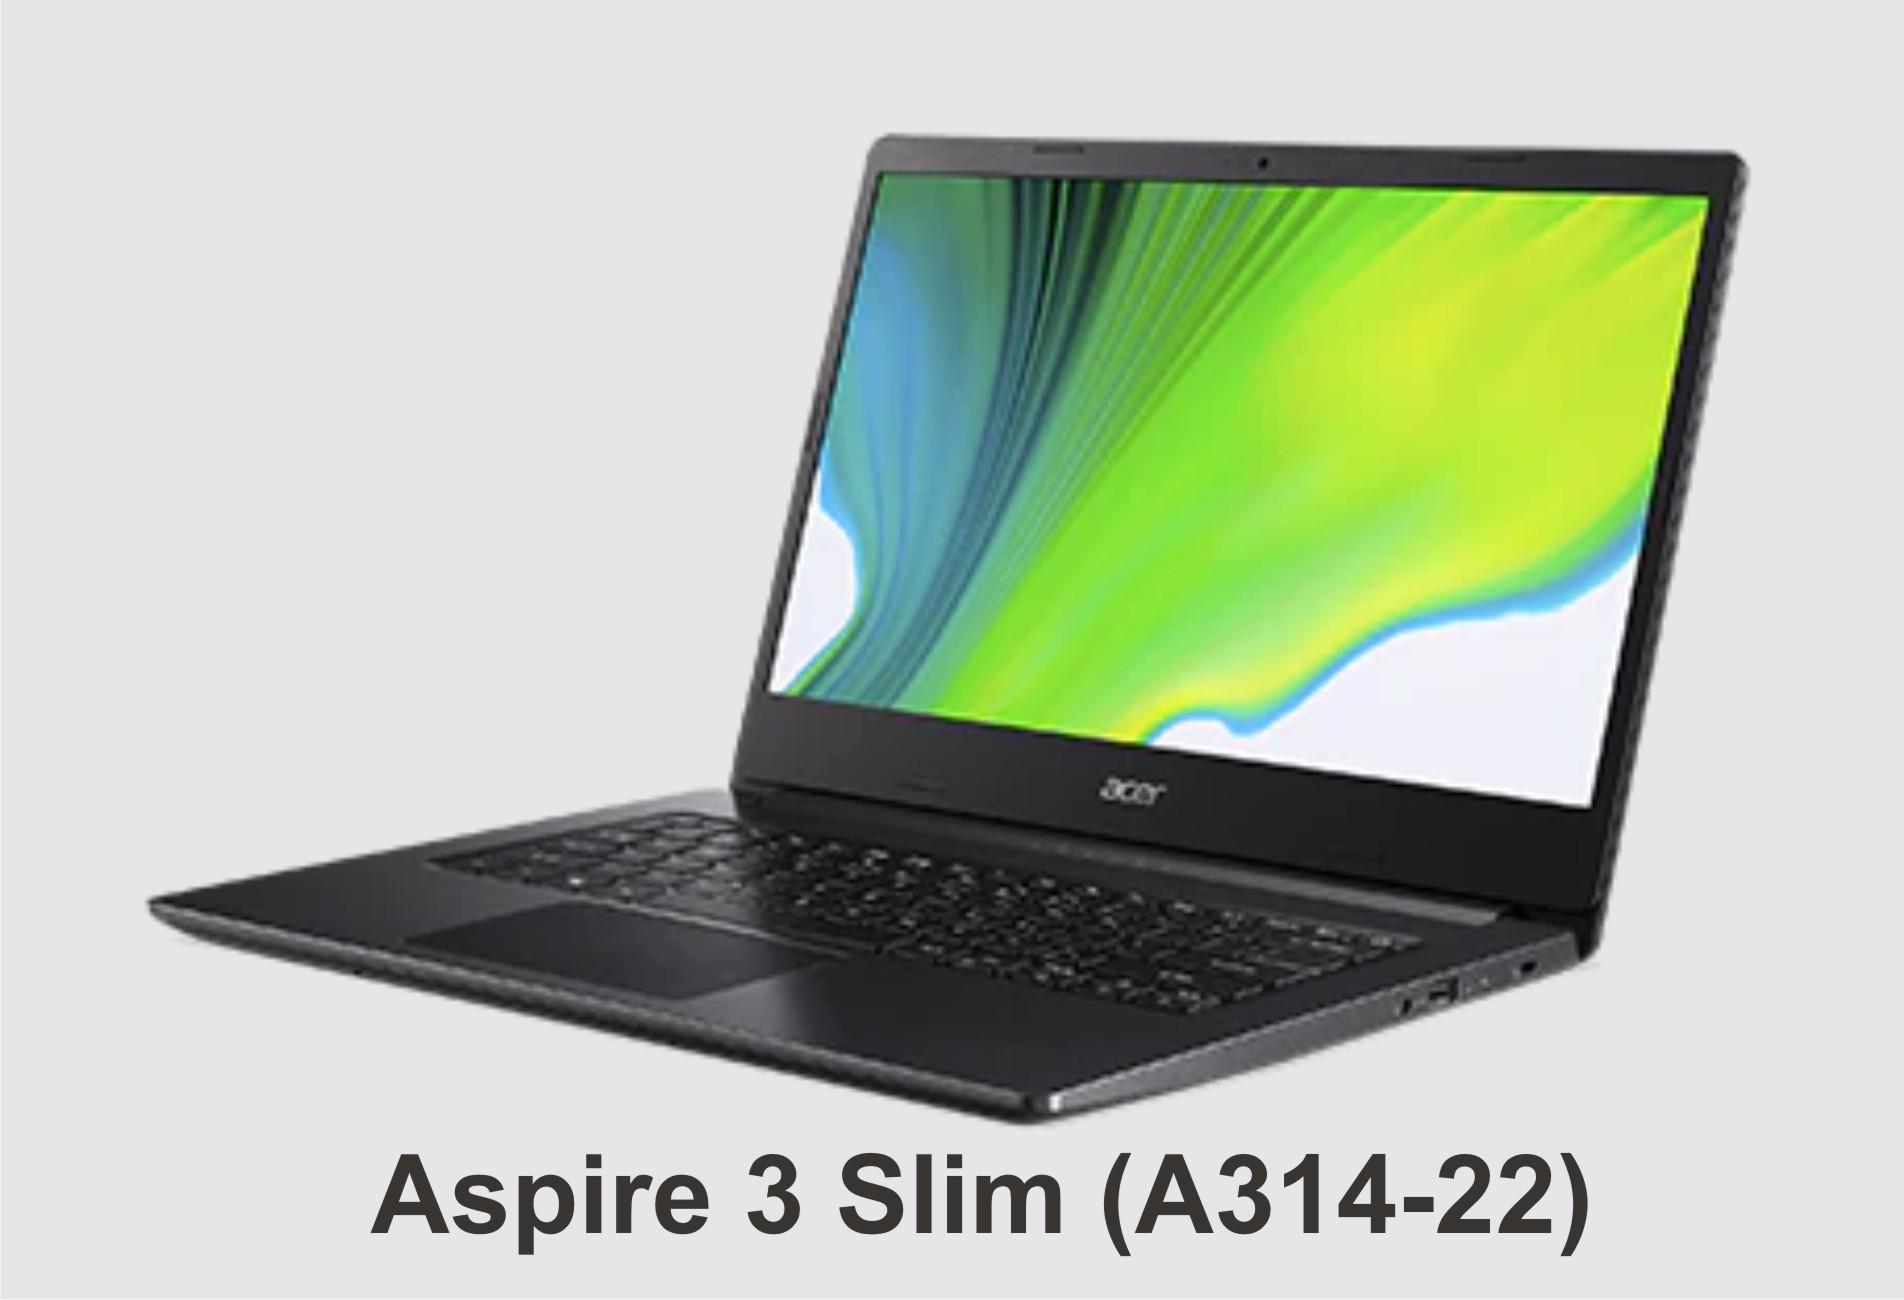 Laptop Harga 6 Jutaan - Aspire 3 Slim (A314-22)